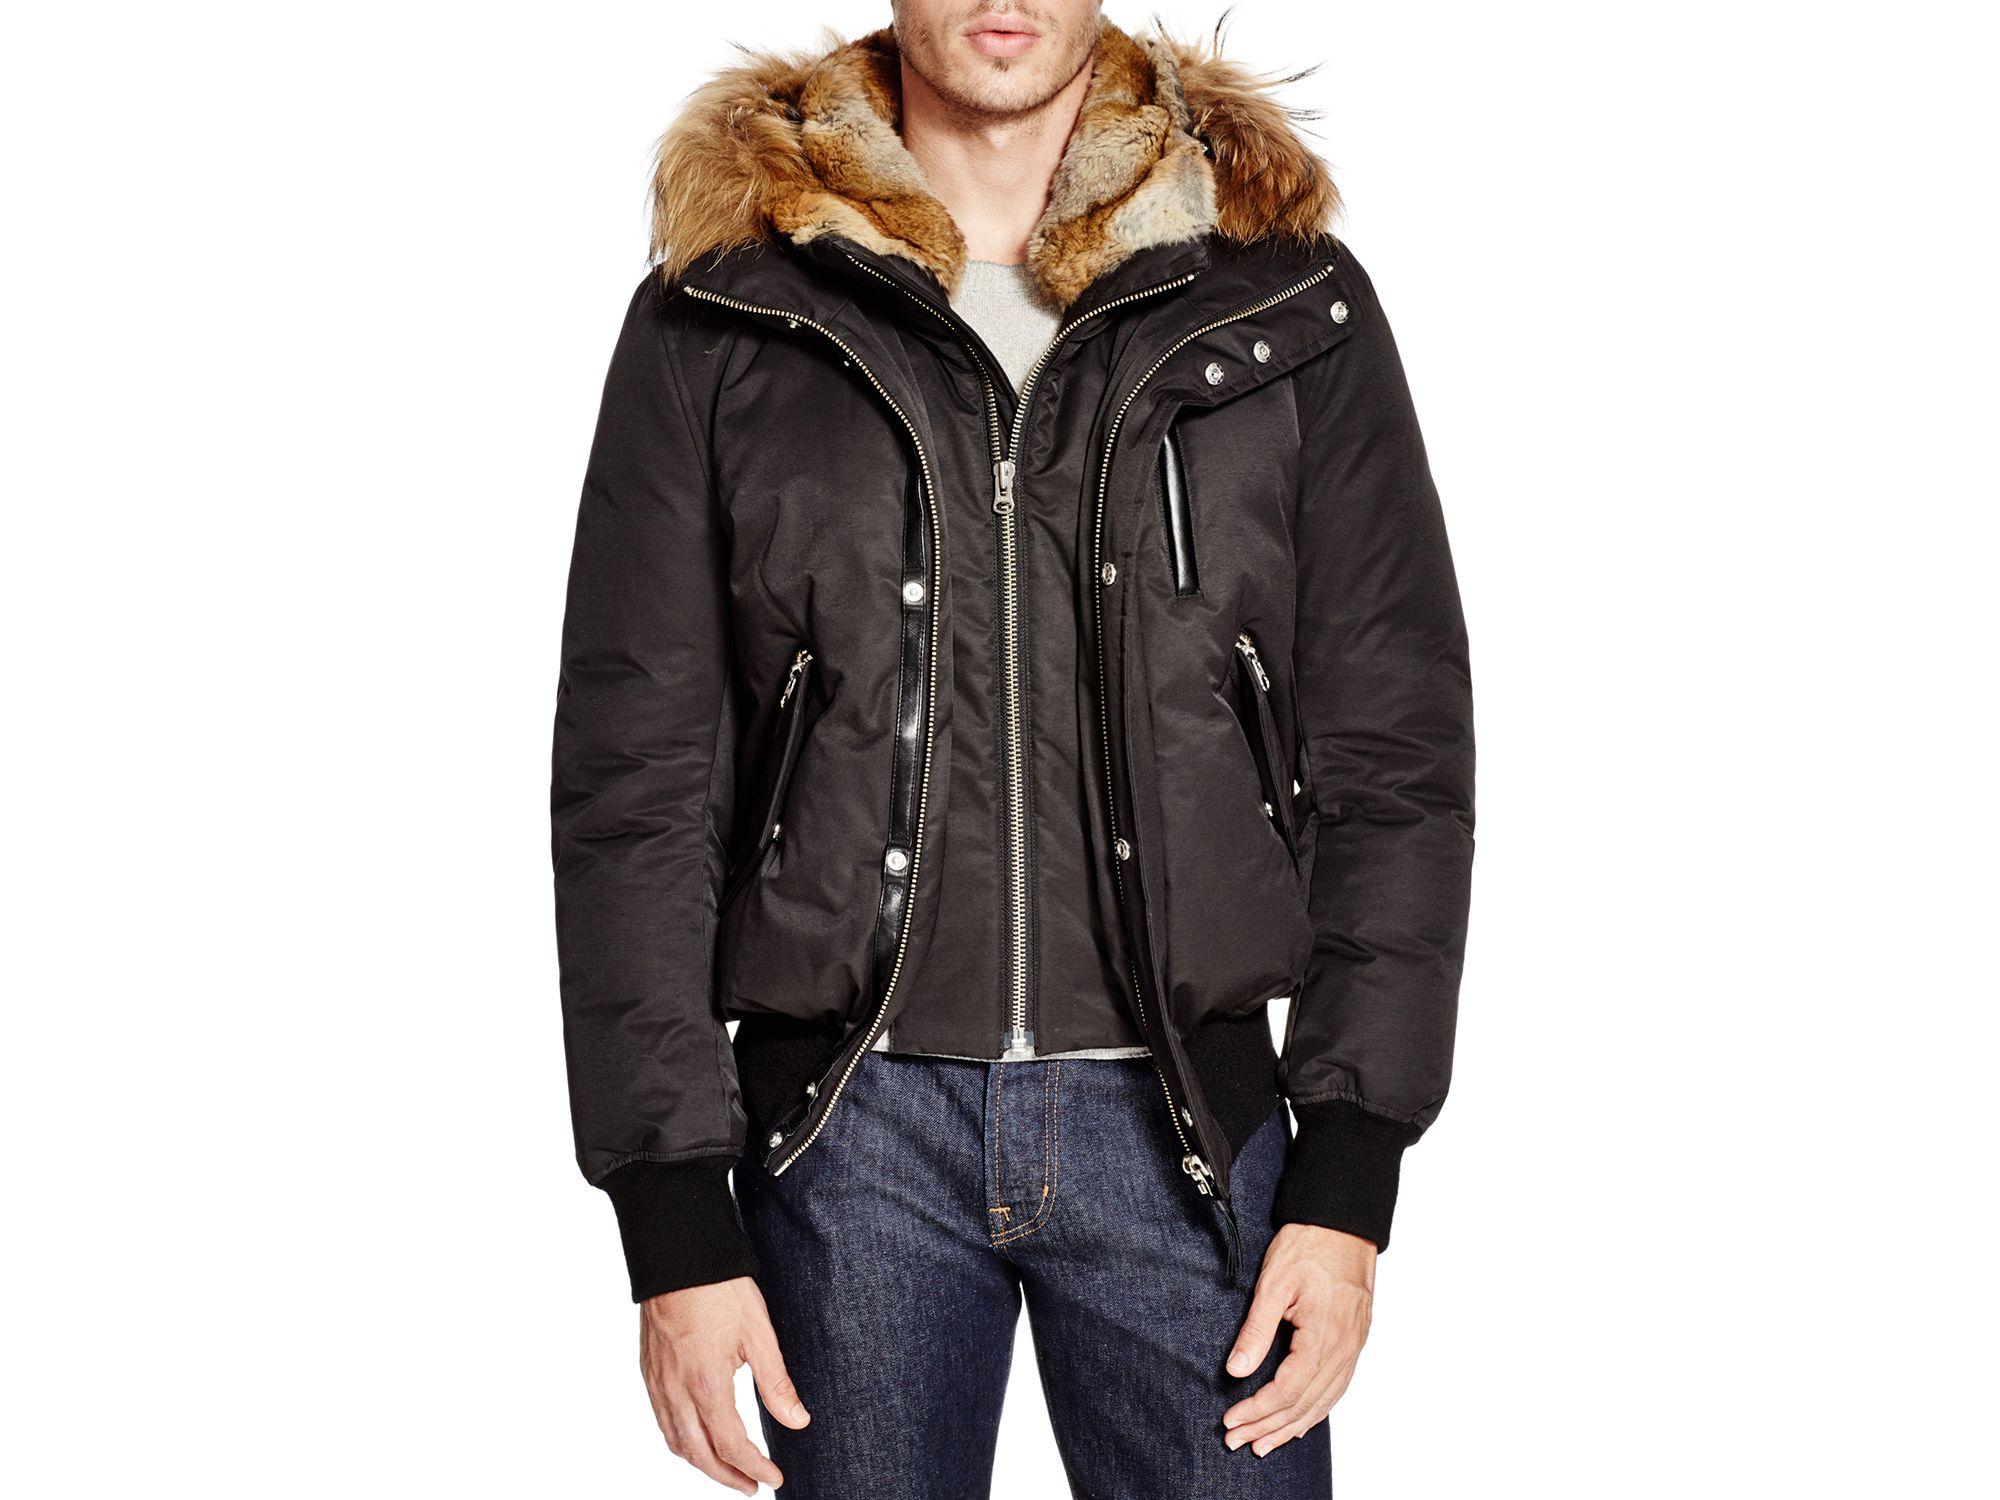 f71cfc4d2e375 uk mackage dixon b down parka e1970 a7204; shopping lyst mackage dixon down  puffer jacket in black for men 1e599 9ee70